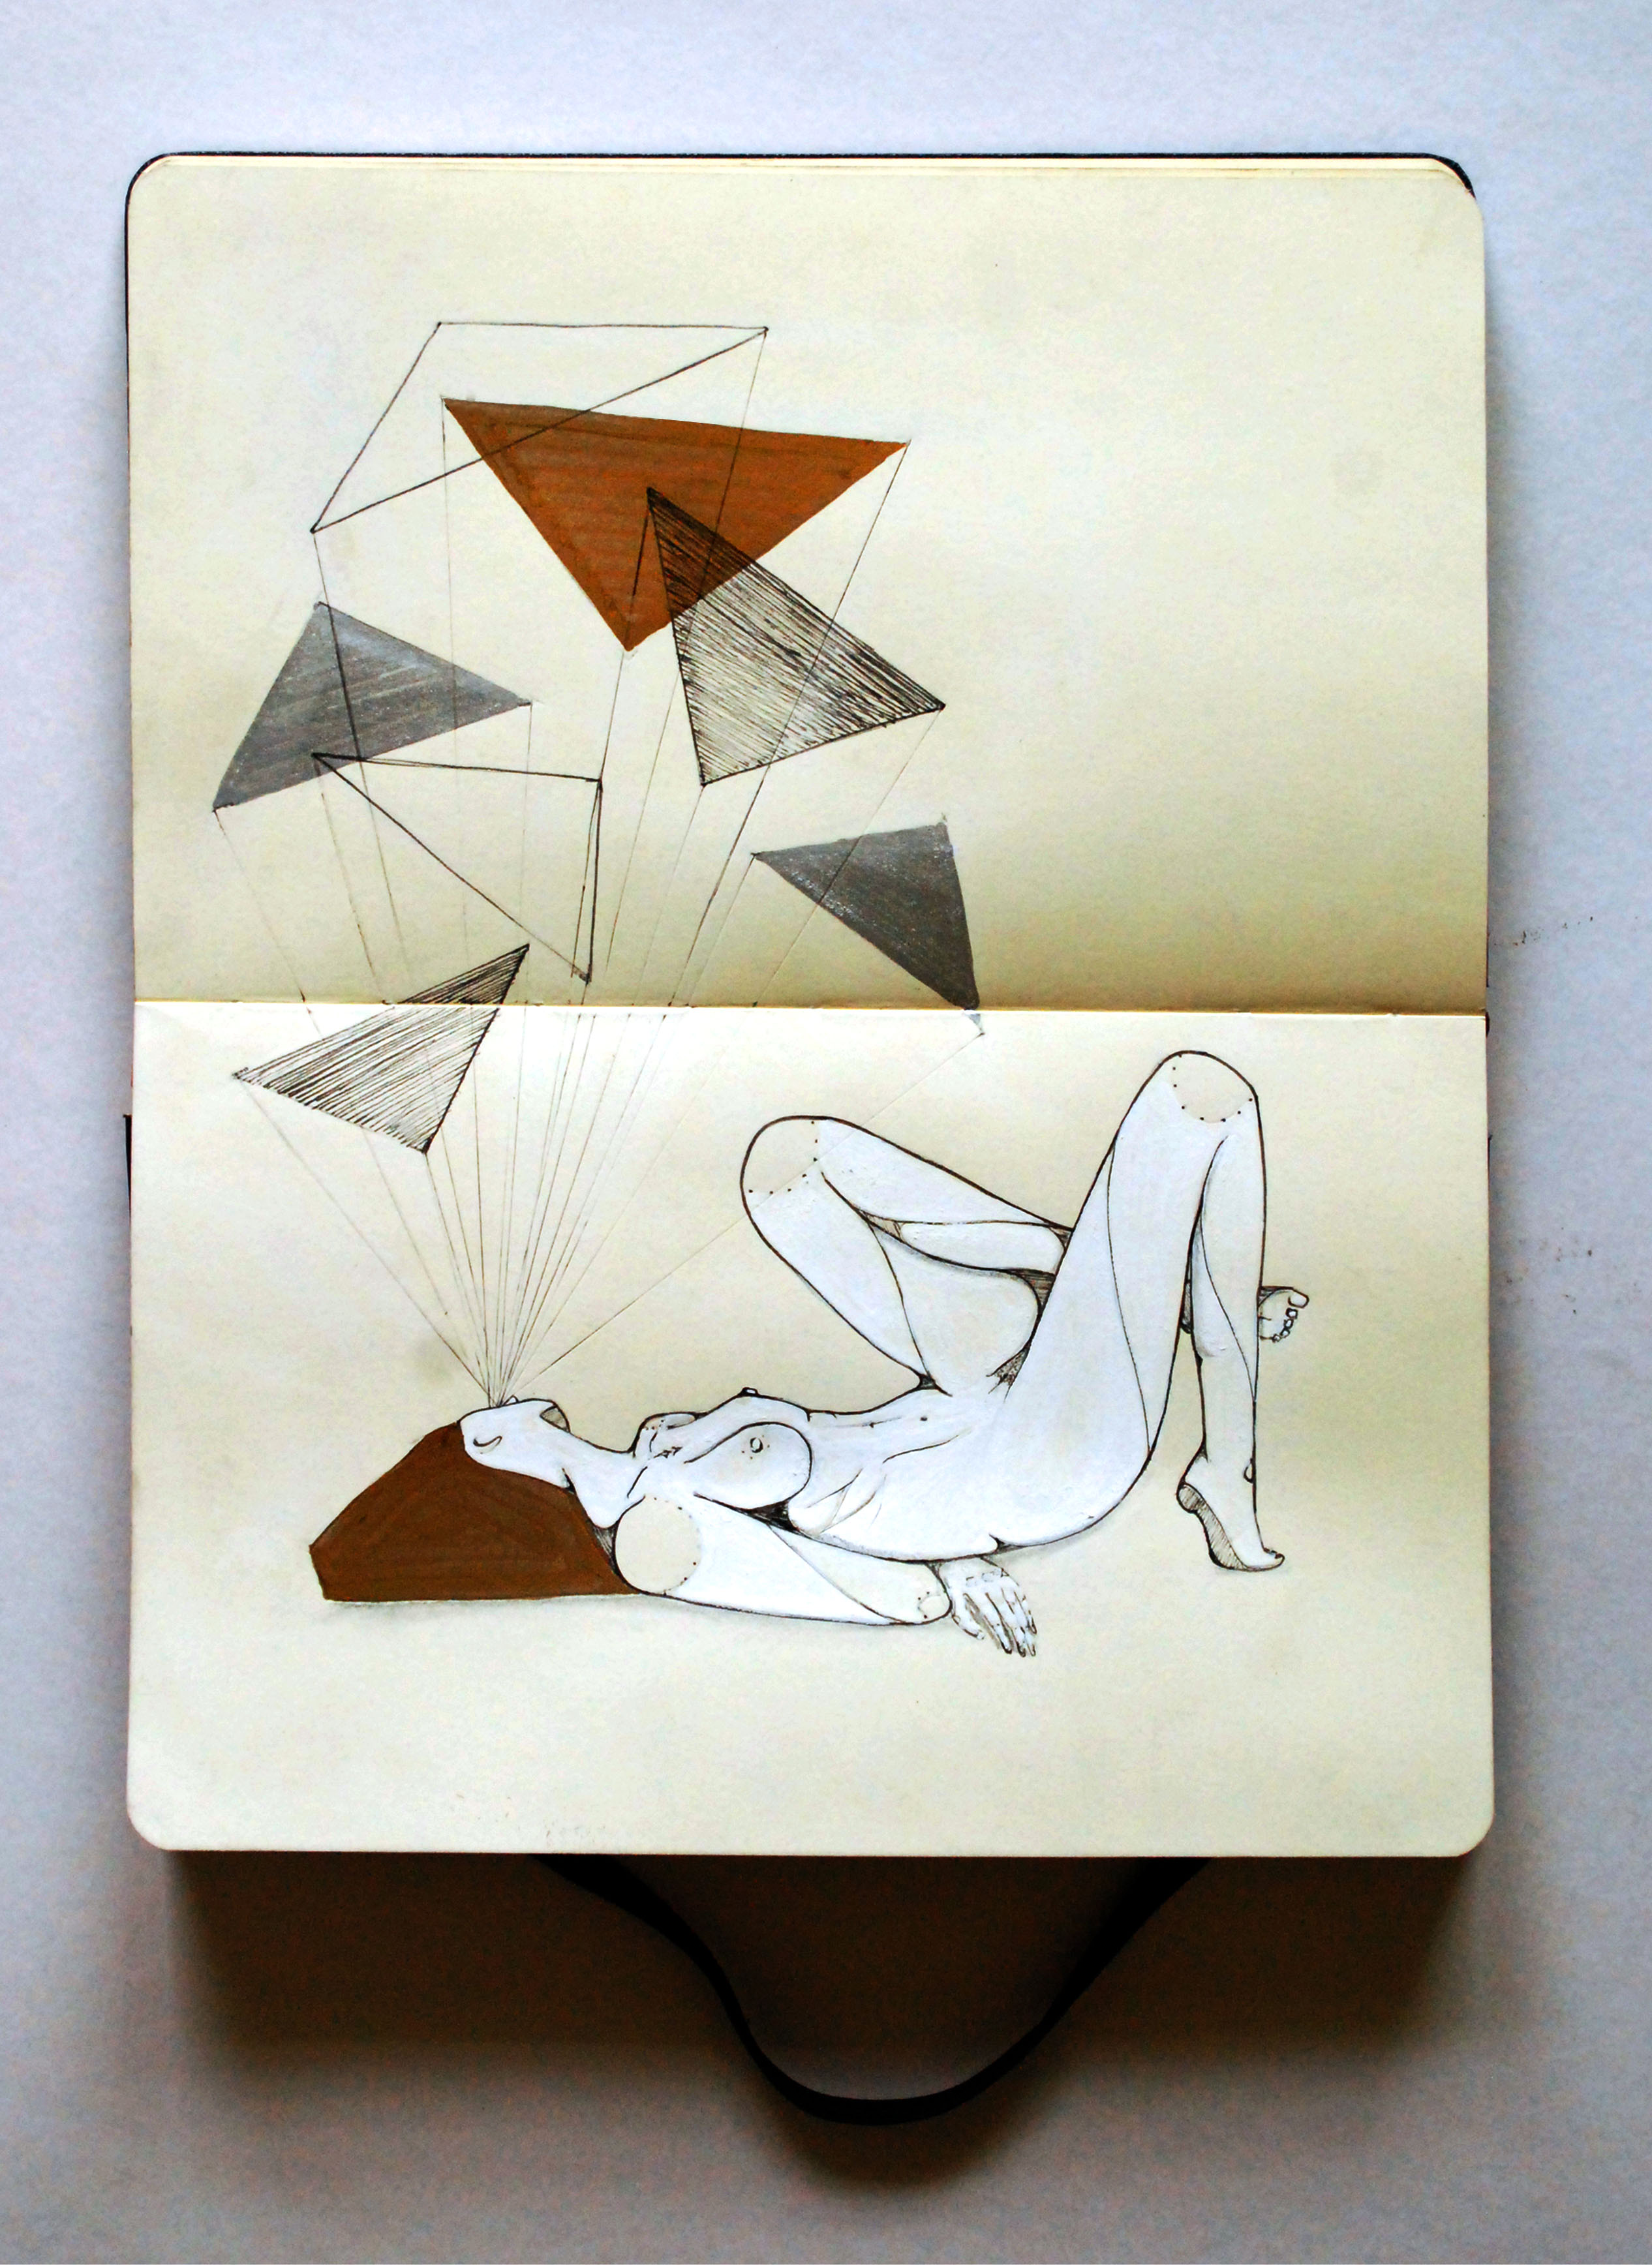 Moleskine | Refúgio | Gabriel Kieling